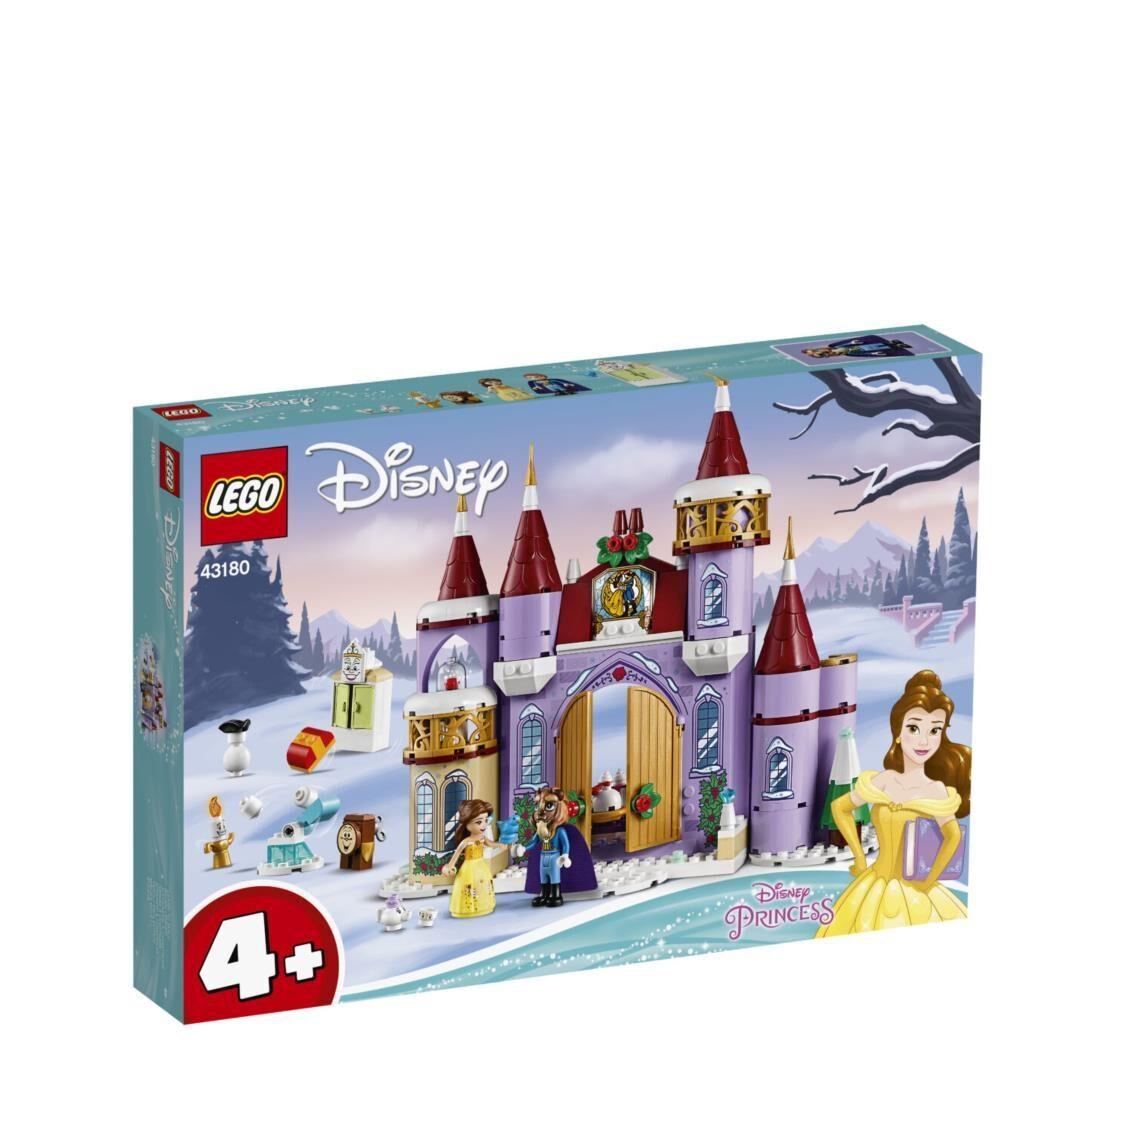 LEGO DISNEY - Belles Castle Winter Celebration 43180